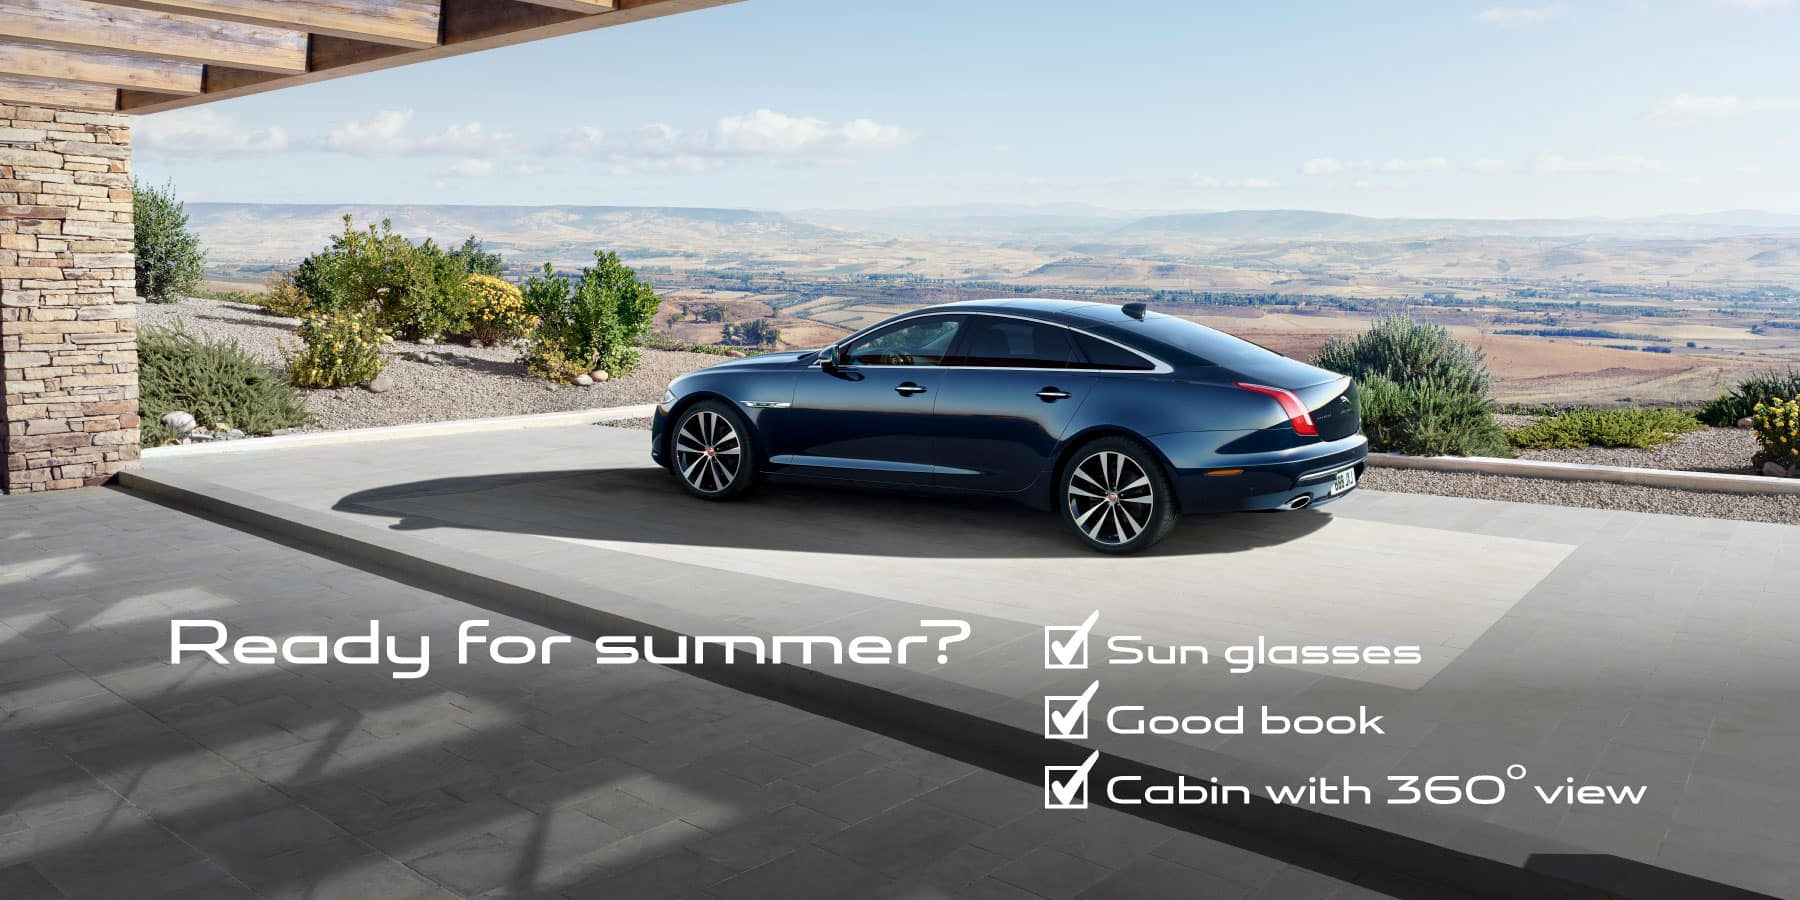 Autobahn Jaguar Fort Worth | Ready for Summer?